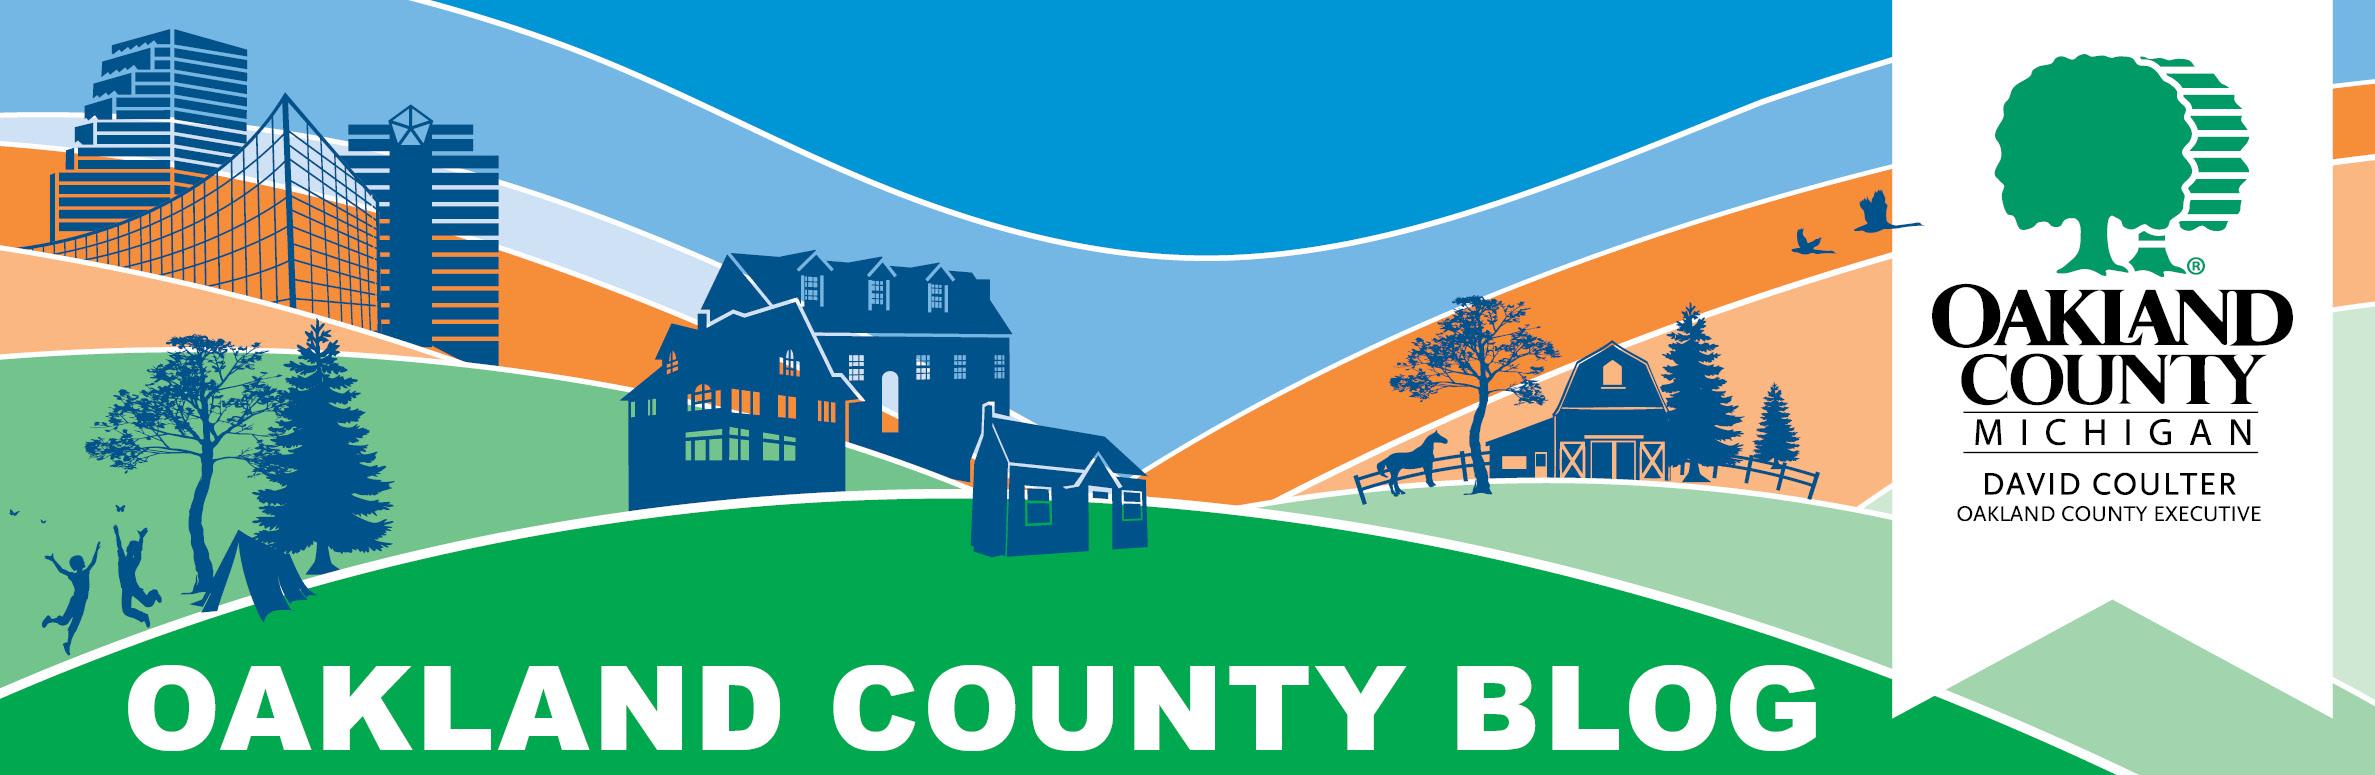 Oakland County Blog